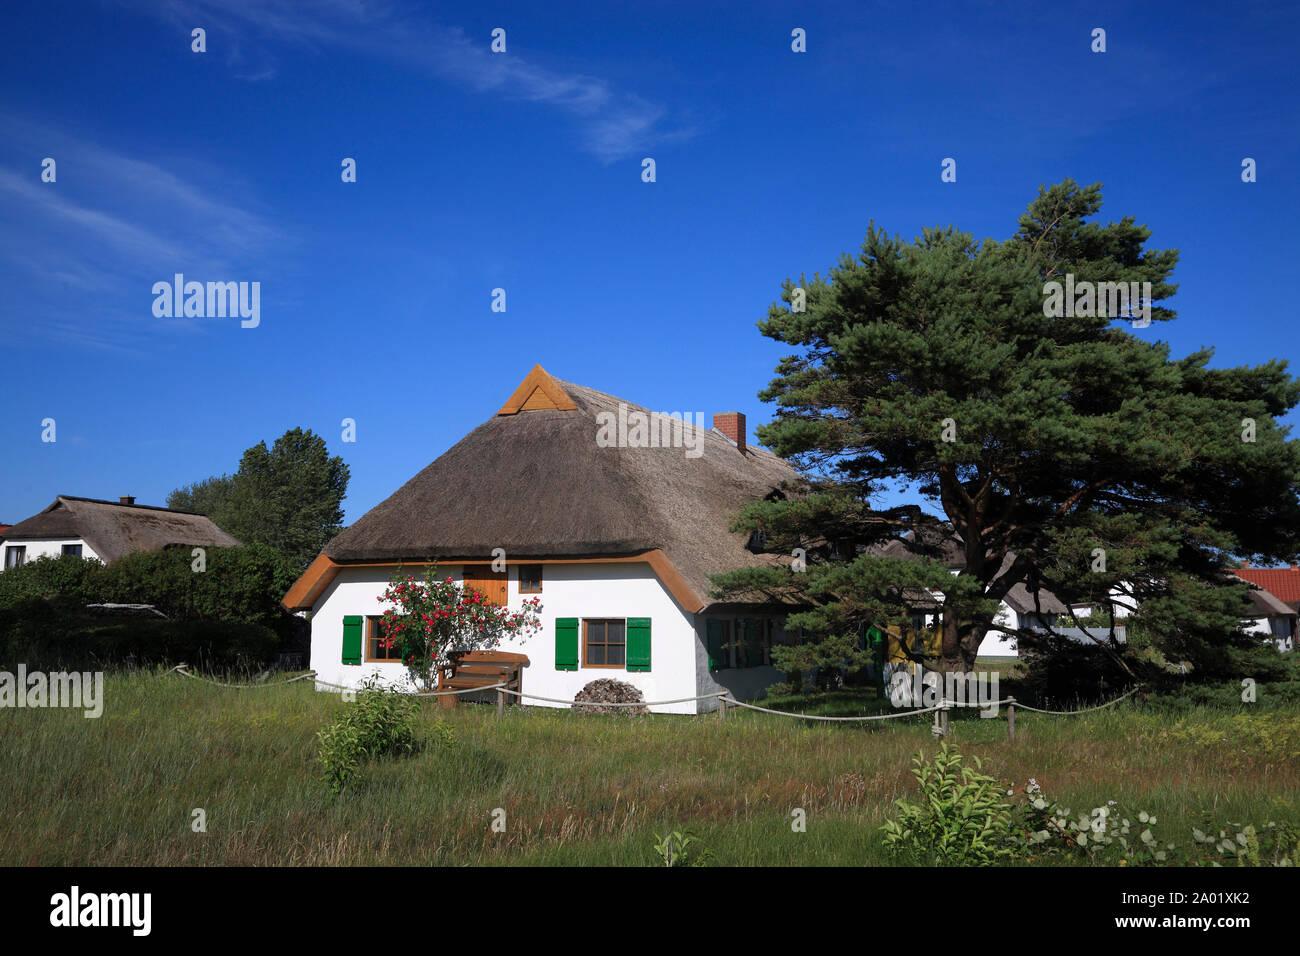 Neuendorf, thatched house, Hiddensee island, Baltic Sea, Mecklenburg Western Pomerania, Germany, Europe Stock Photo